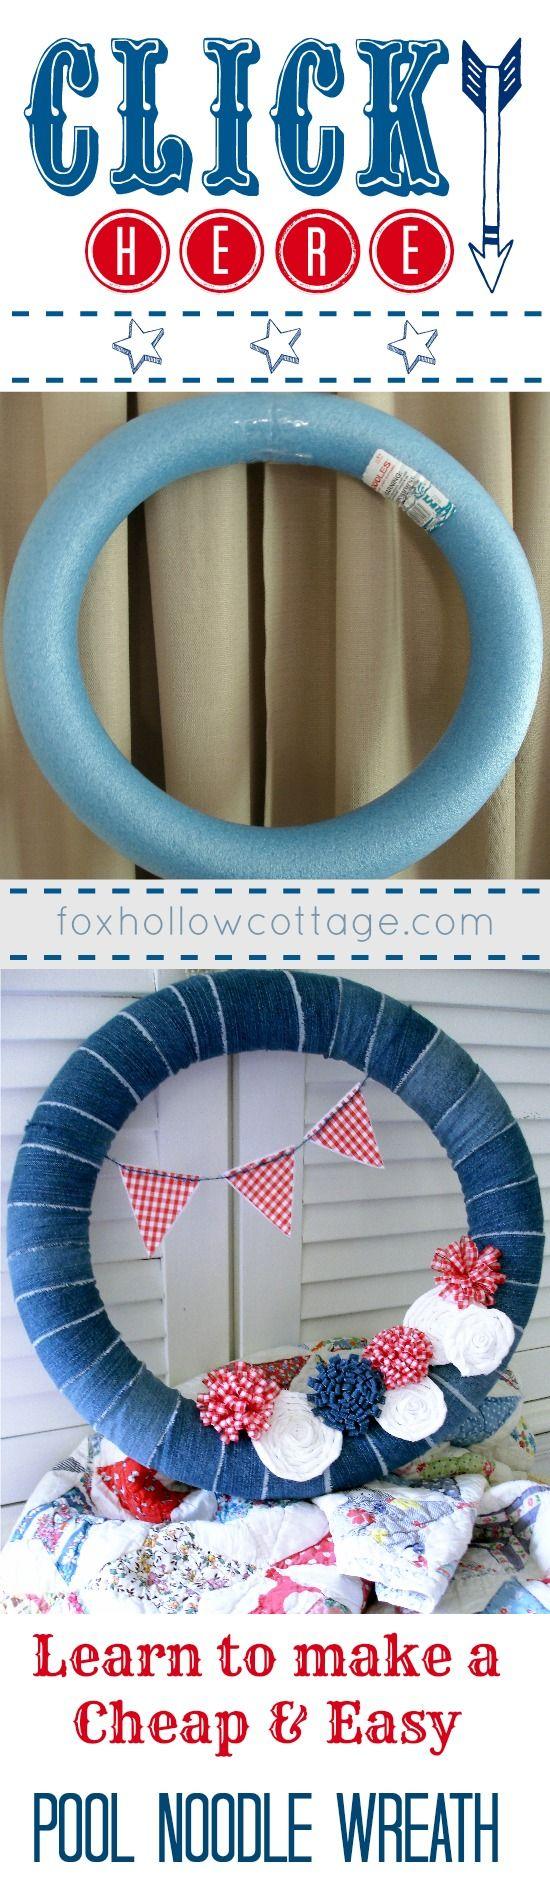 DIY Pool Noodle Wreath Tutorial -- Patriotic Repurposed Denim